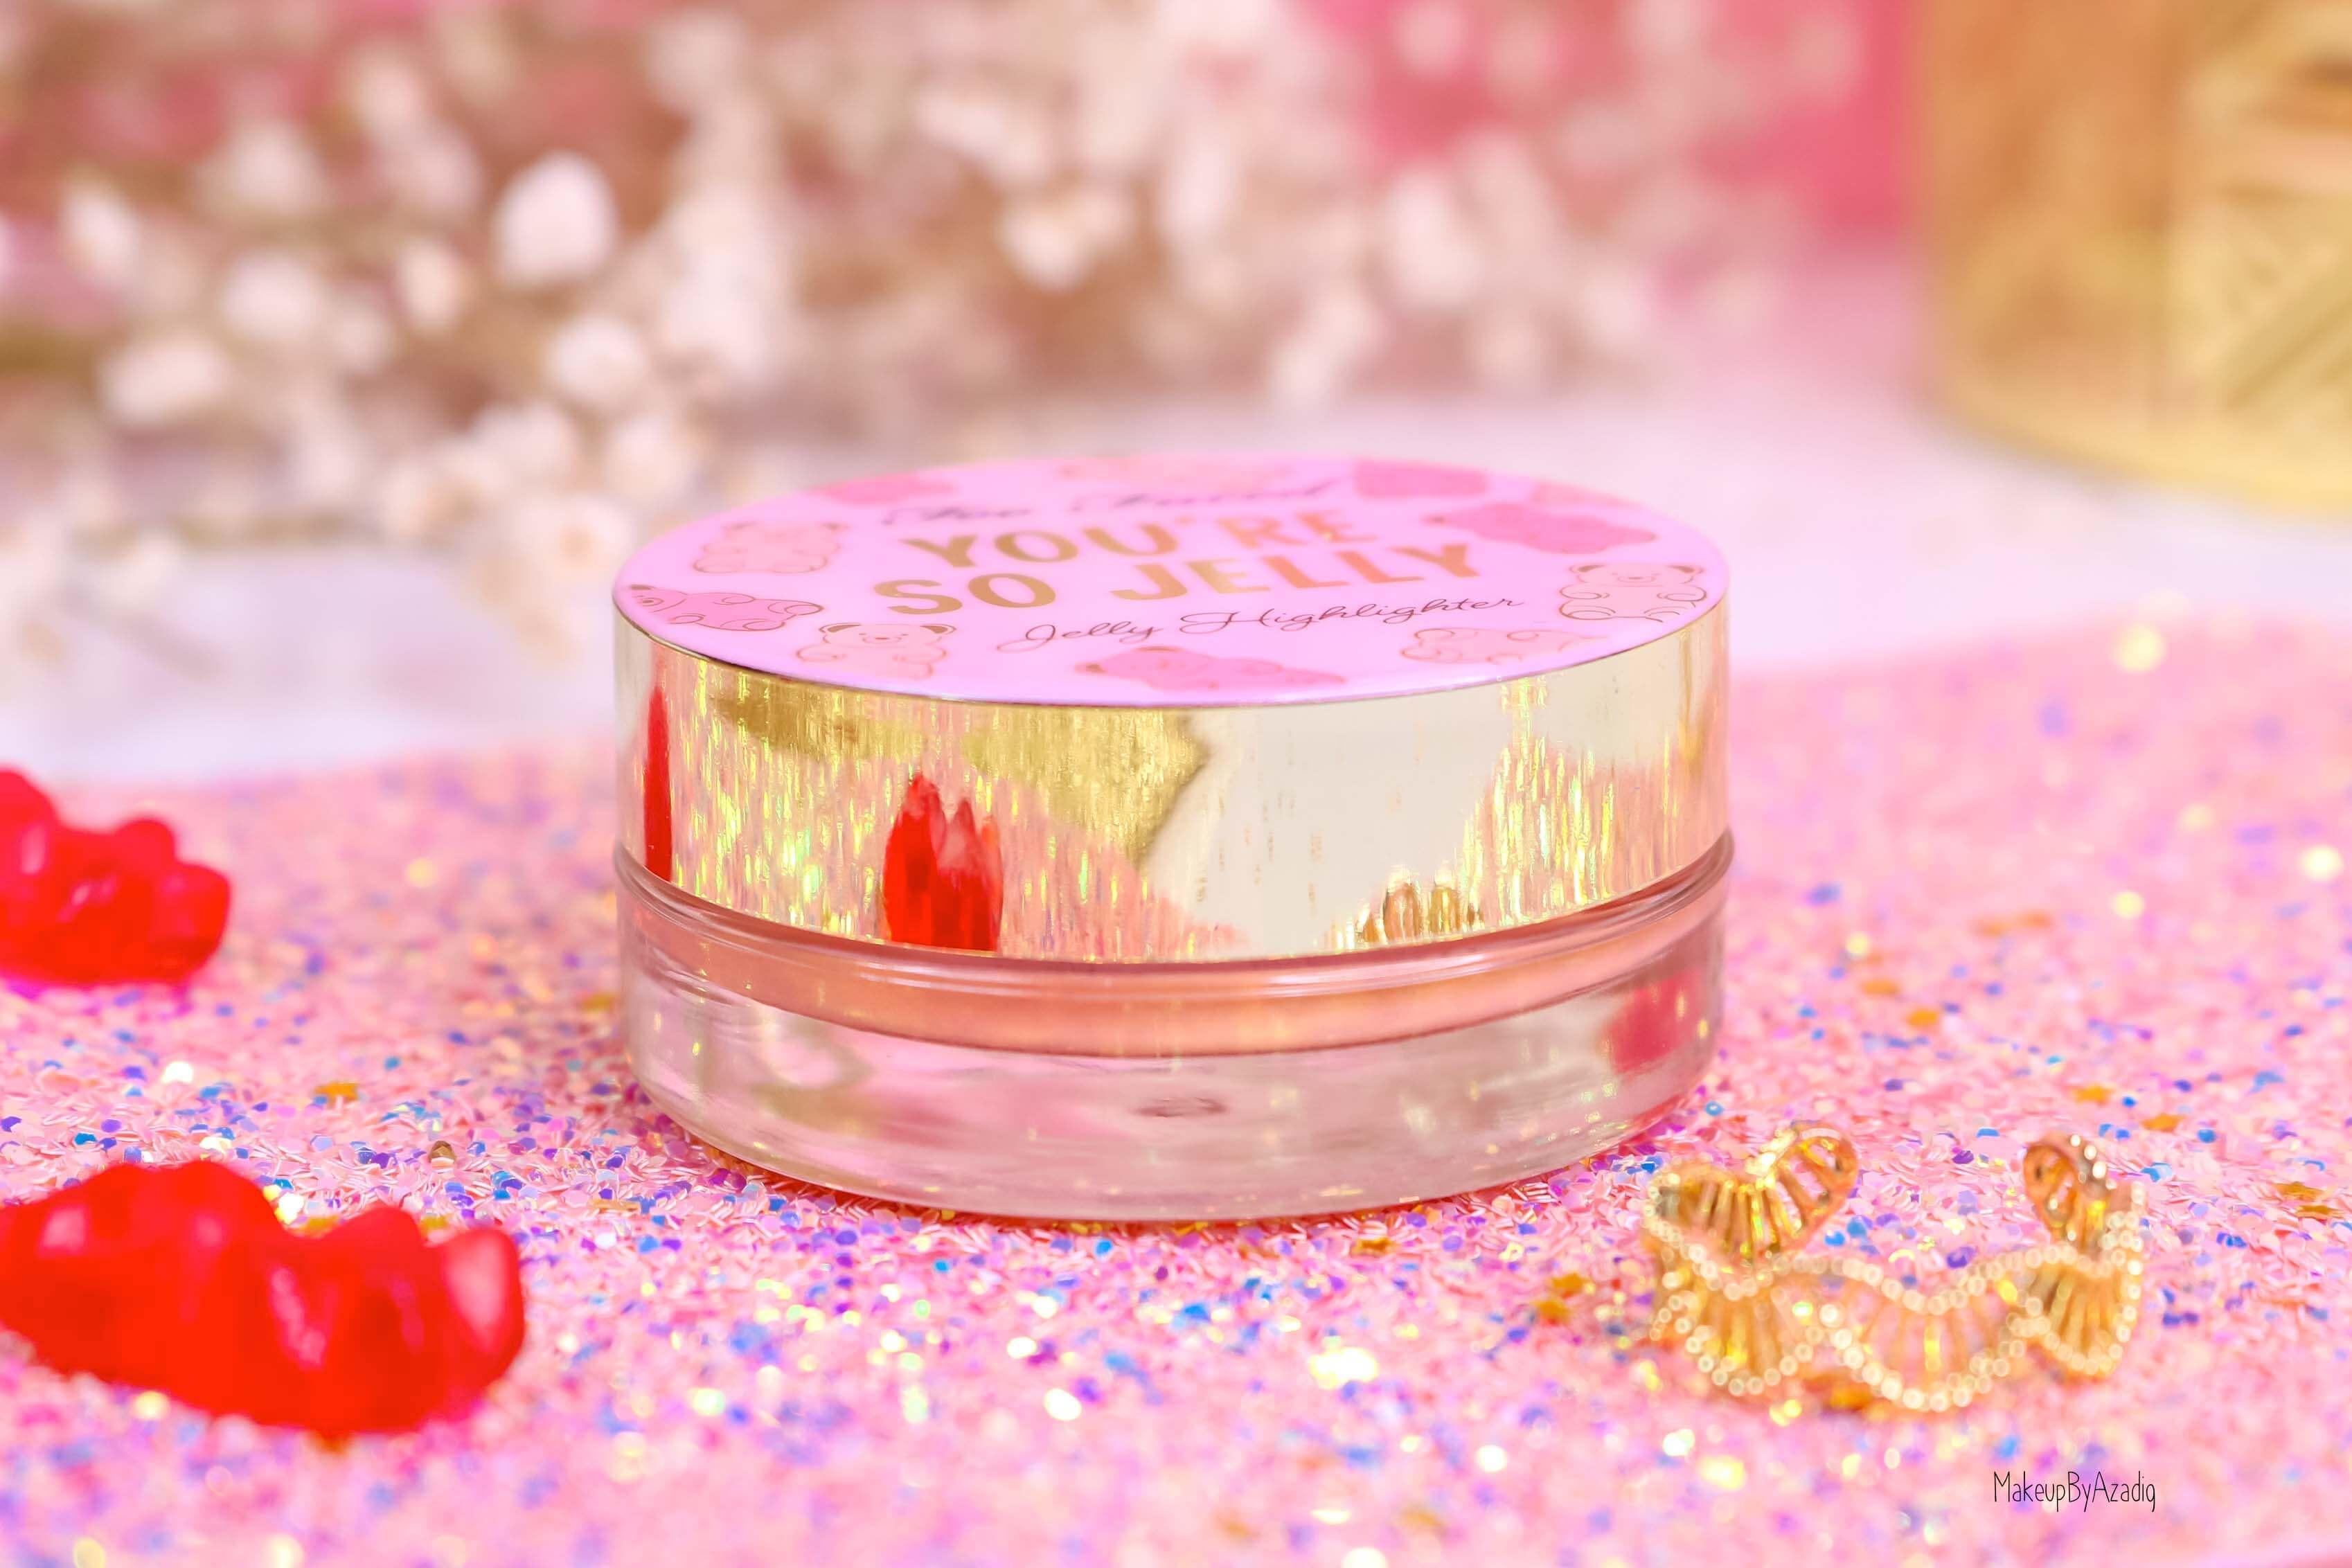 revue-highlighter-jelly-gel-rose-pink-too-faced-texture-cute-avis-prix-swatch-makeupbyazadig-sephora-france-gold